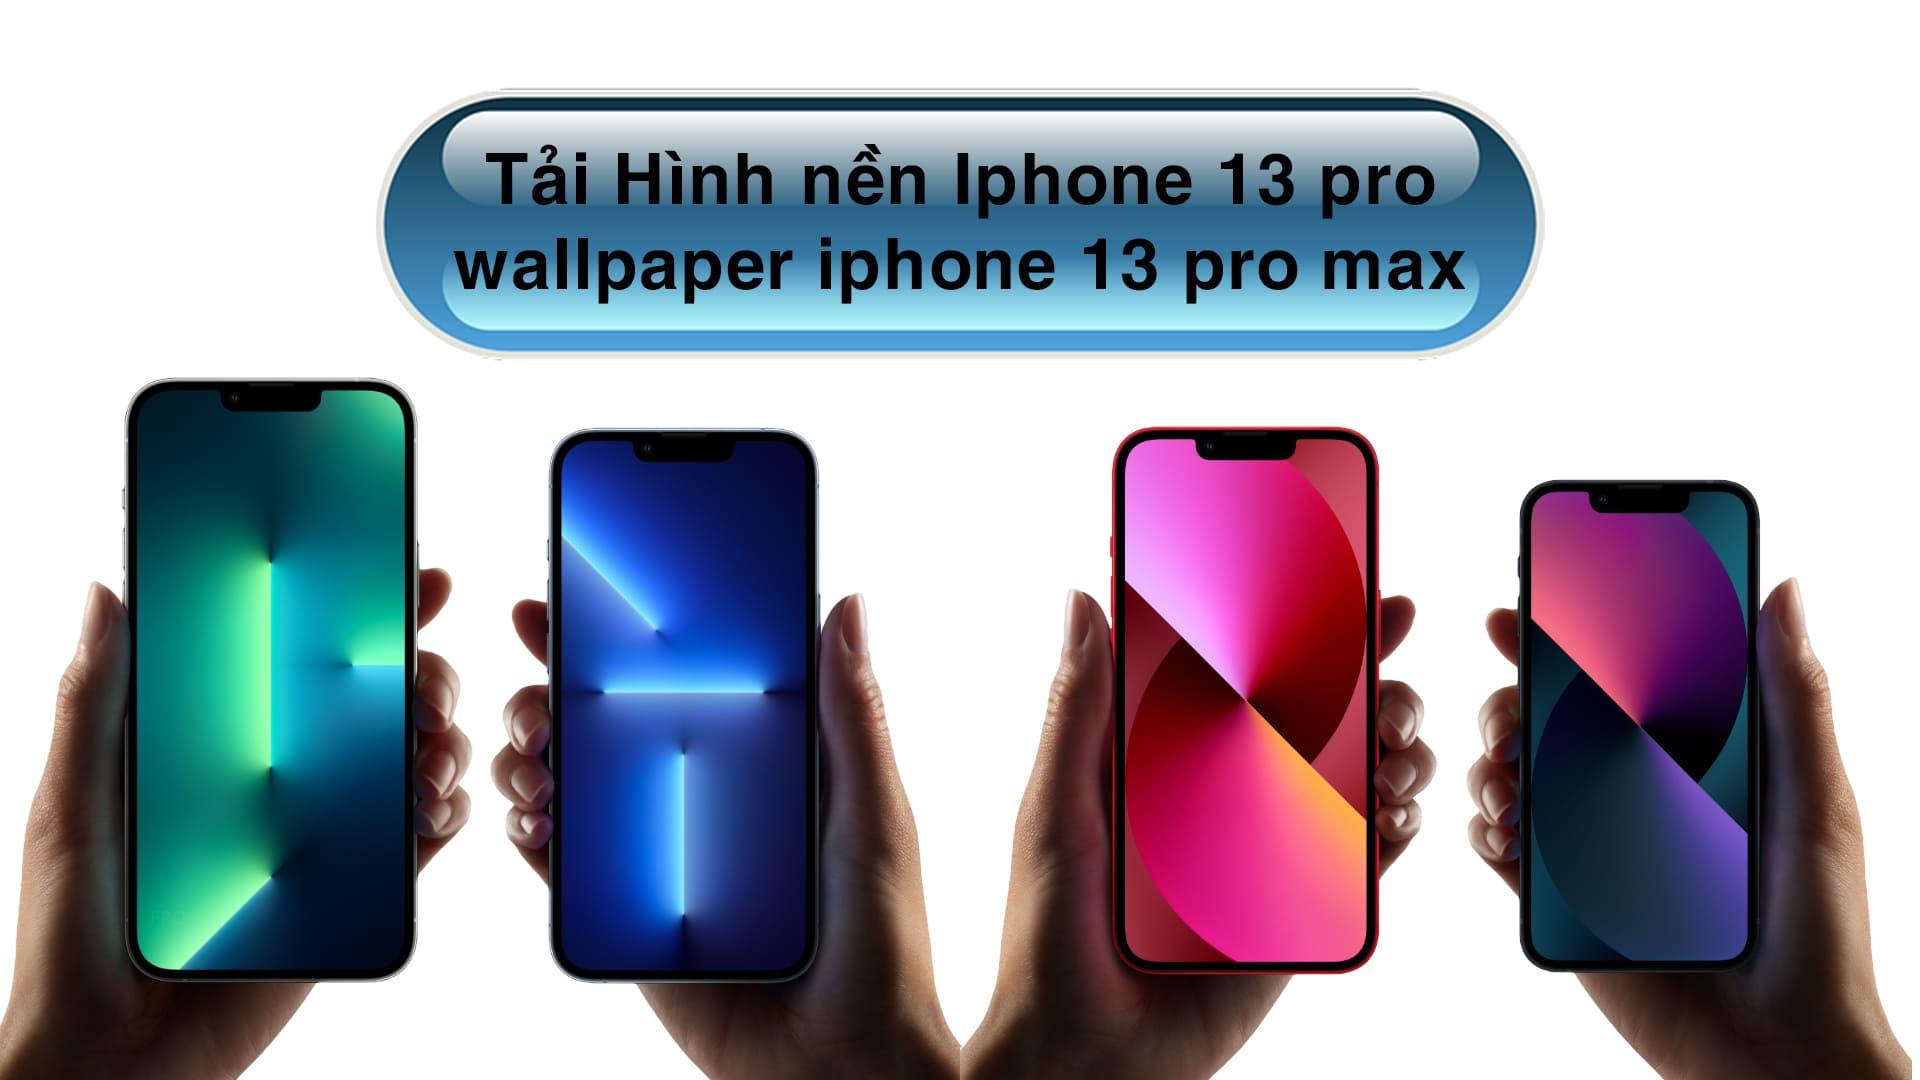 tải hình nền iphone 13 pro max iphone 13 wallpaper